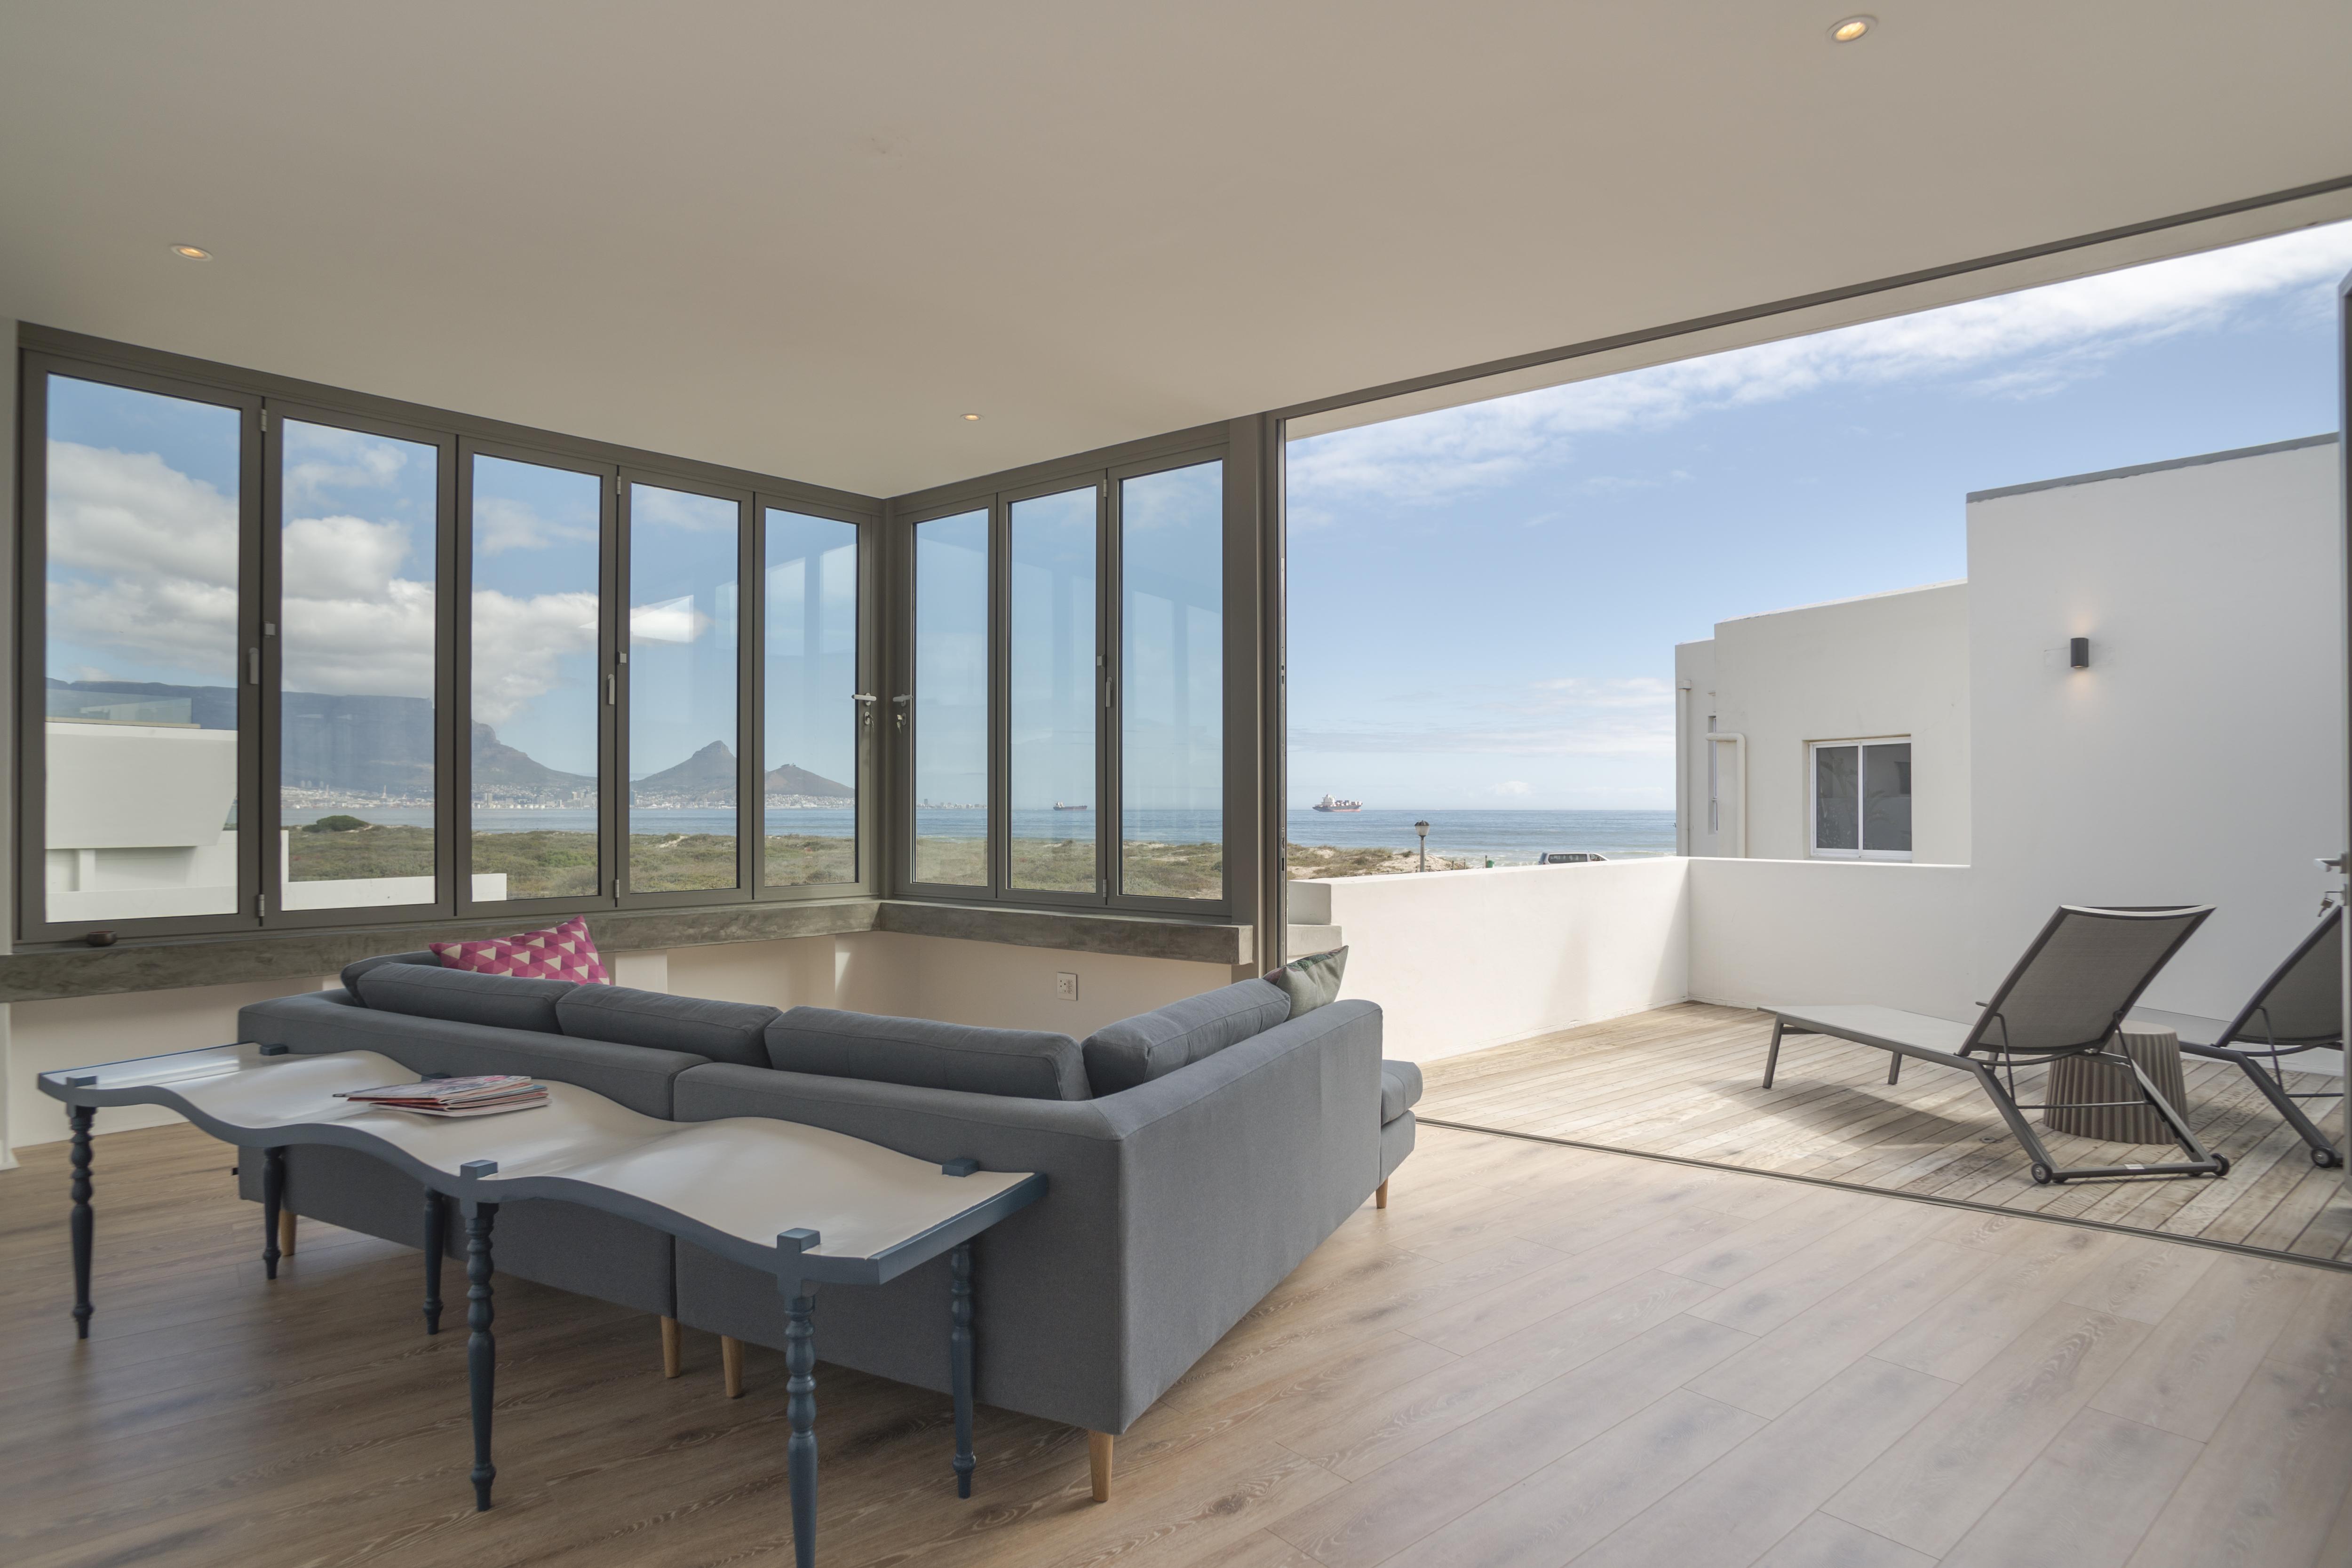 Ocean10 Upper Deck Luxury 2BR apartment in Sunset Beach